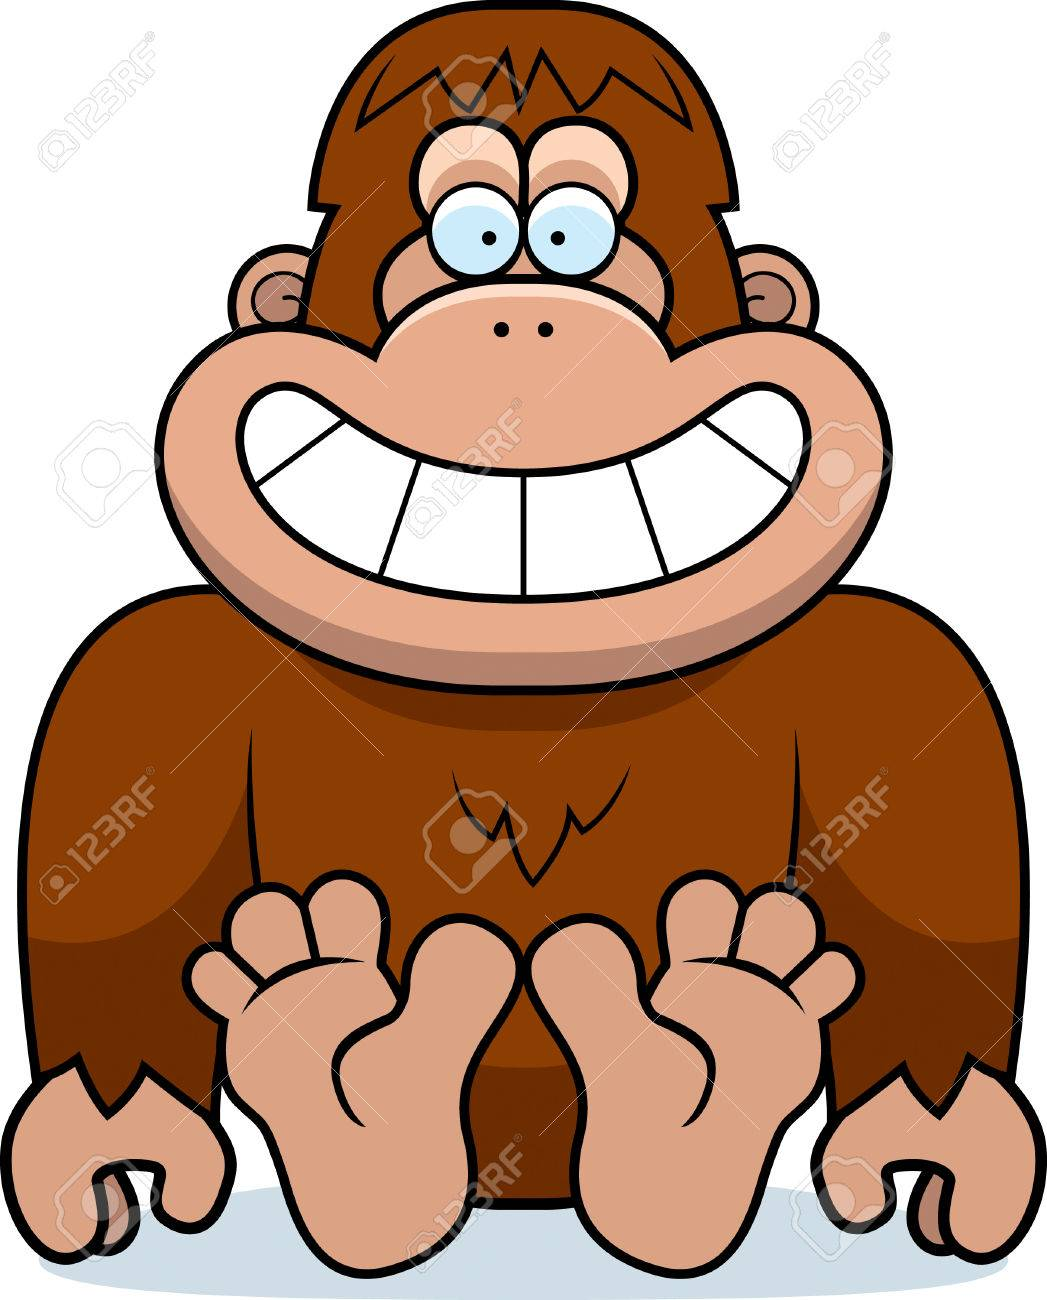 a cartoon illustration of a bigfoot sitting royalty free cliparts rh 123rf com bigfoot clip art images bigfoot clip art free